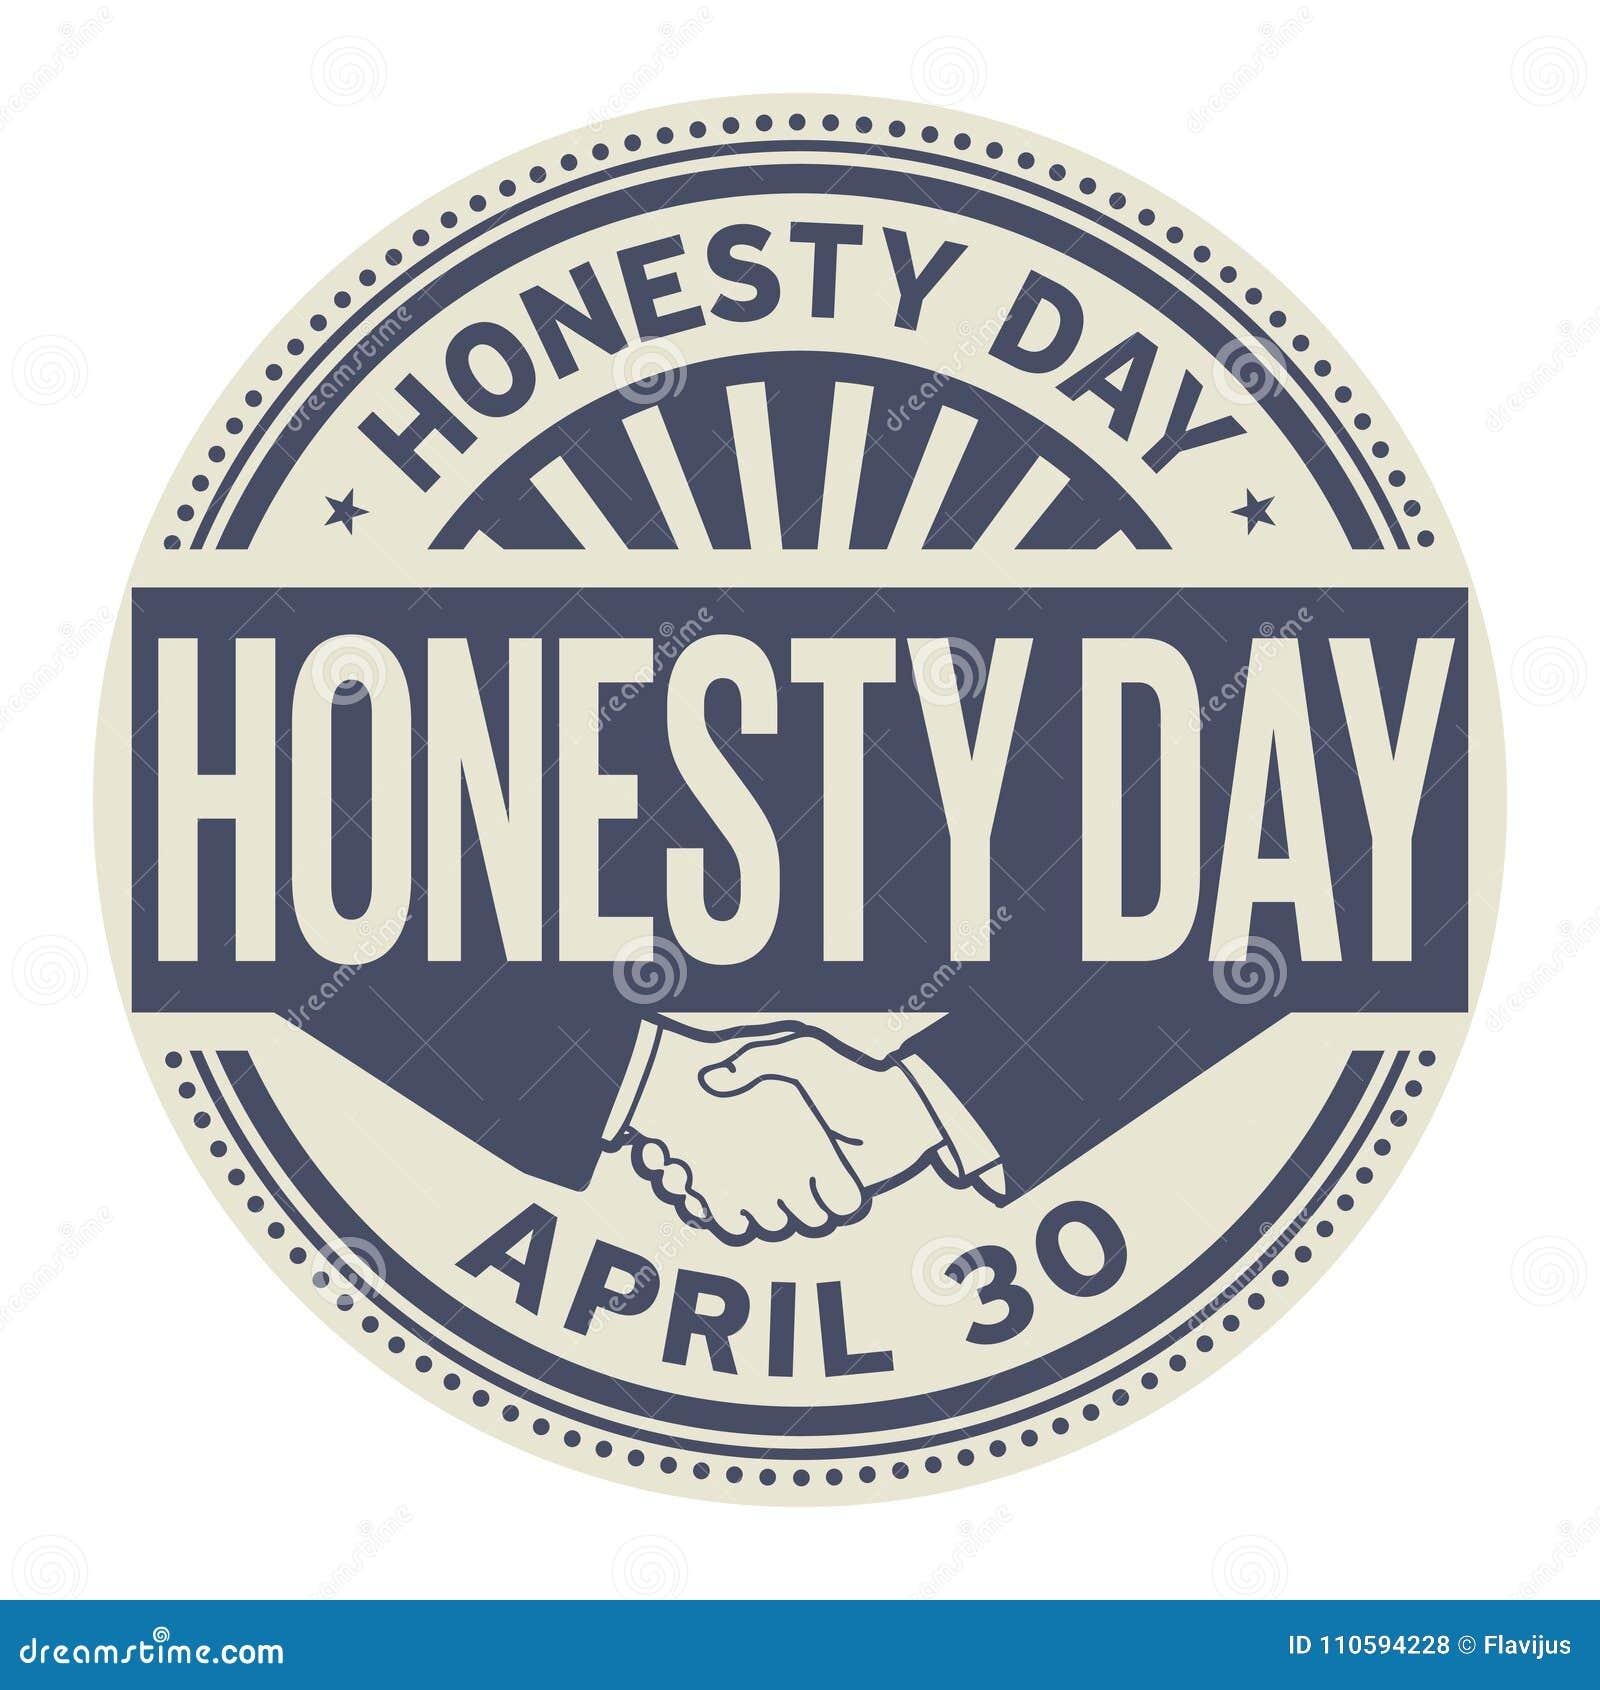 Honesty Day stamp